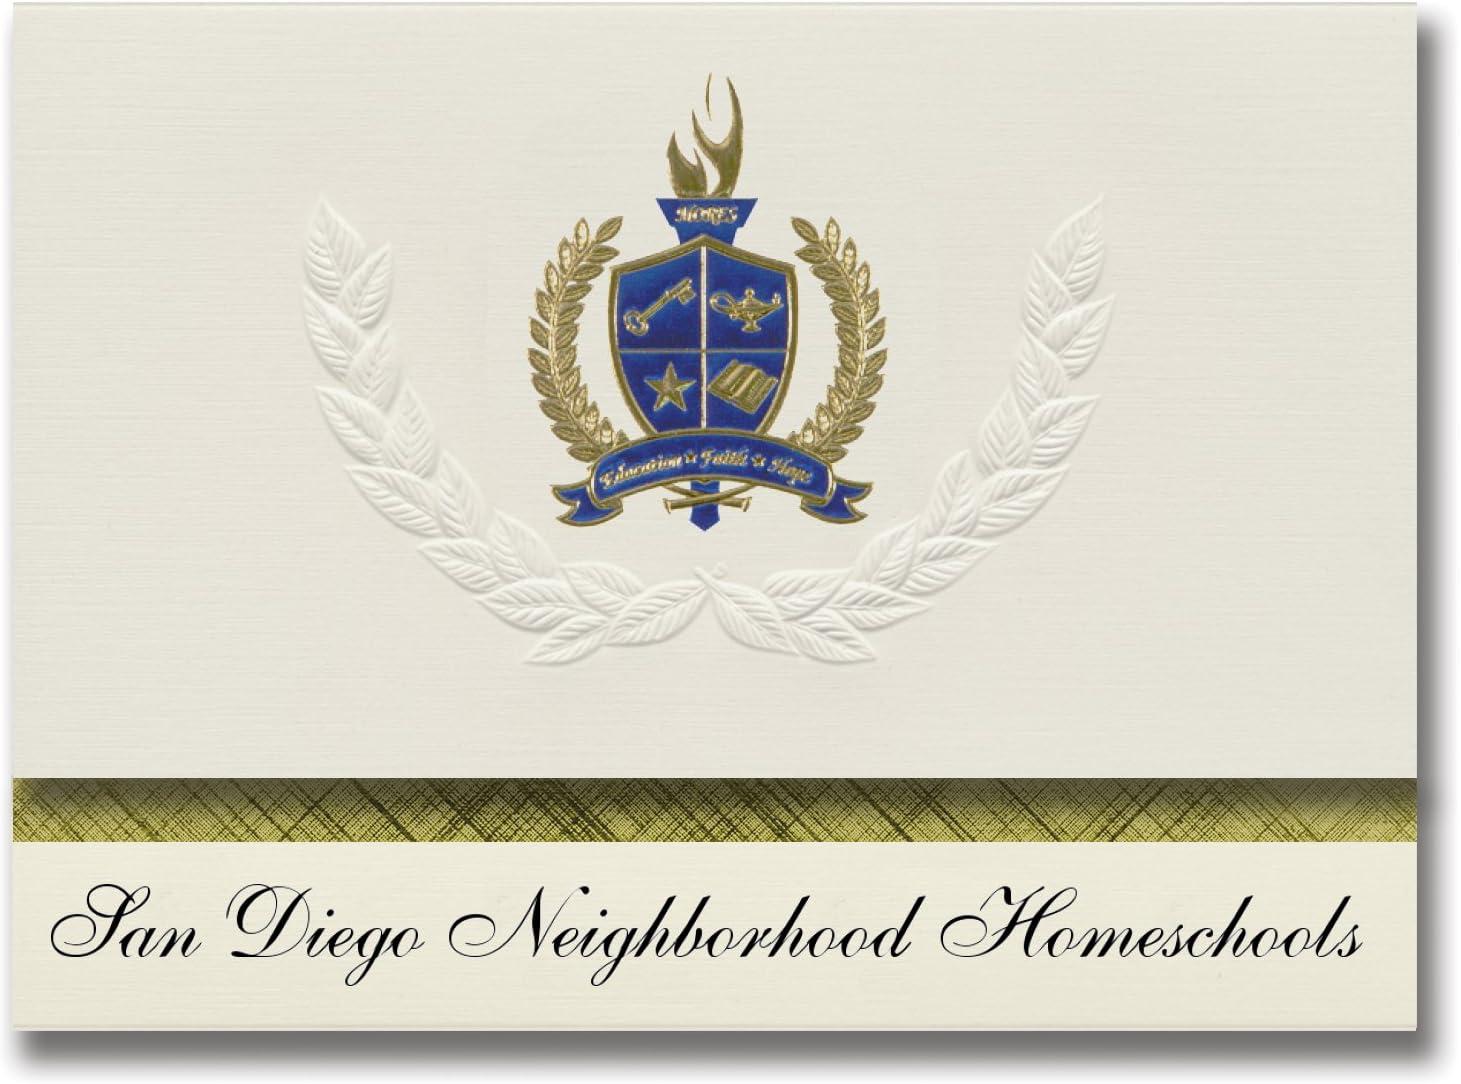 Signature Announcements San Diego Neighborhood Homeschools (Oceanside, CA) Graduation Announcements, Presidential Elite Pack 25 with Gold & Blue Metallic Foil seal